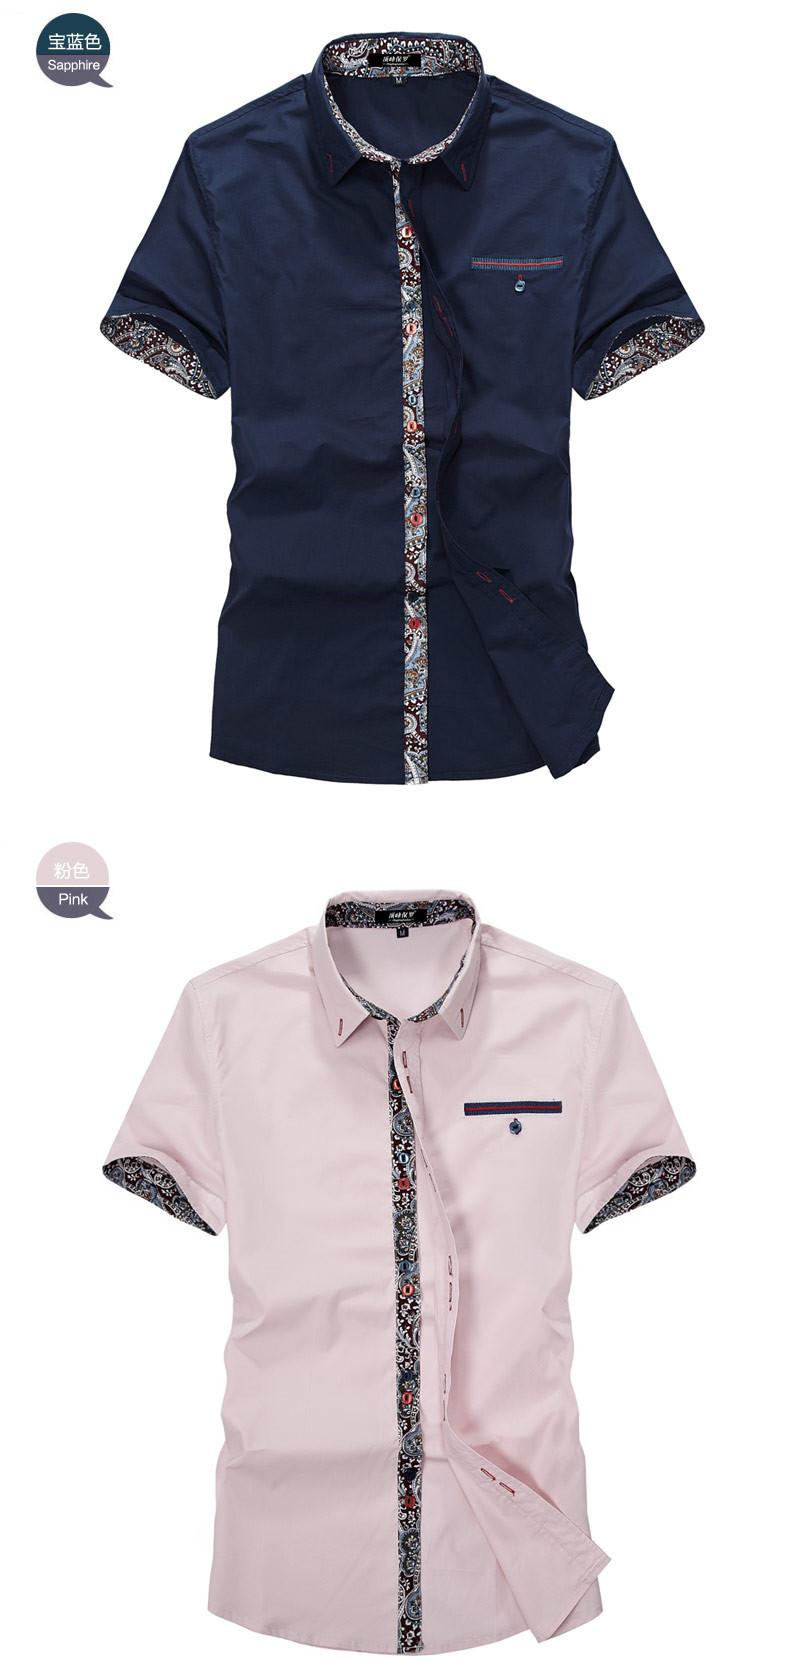 2015 Men Shirt New Brand Shirts Short Sleeve Casual Shirt Men Slim Fit Brand Design Formal Shirt Camisa Social Chemise Homme9